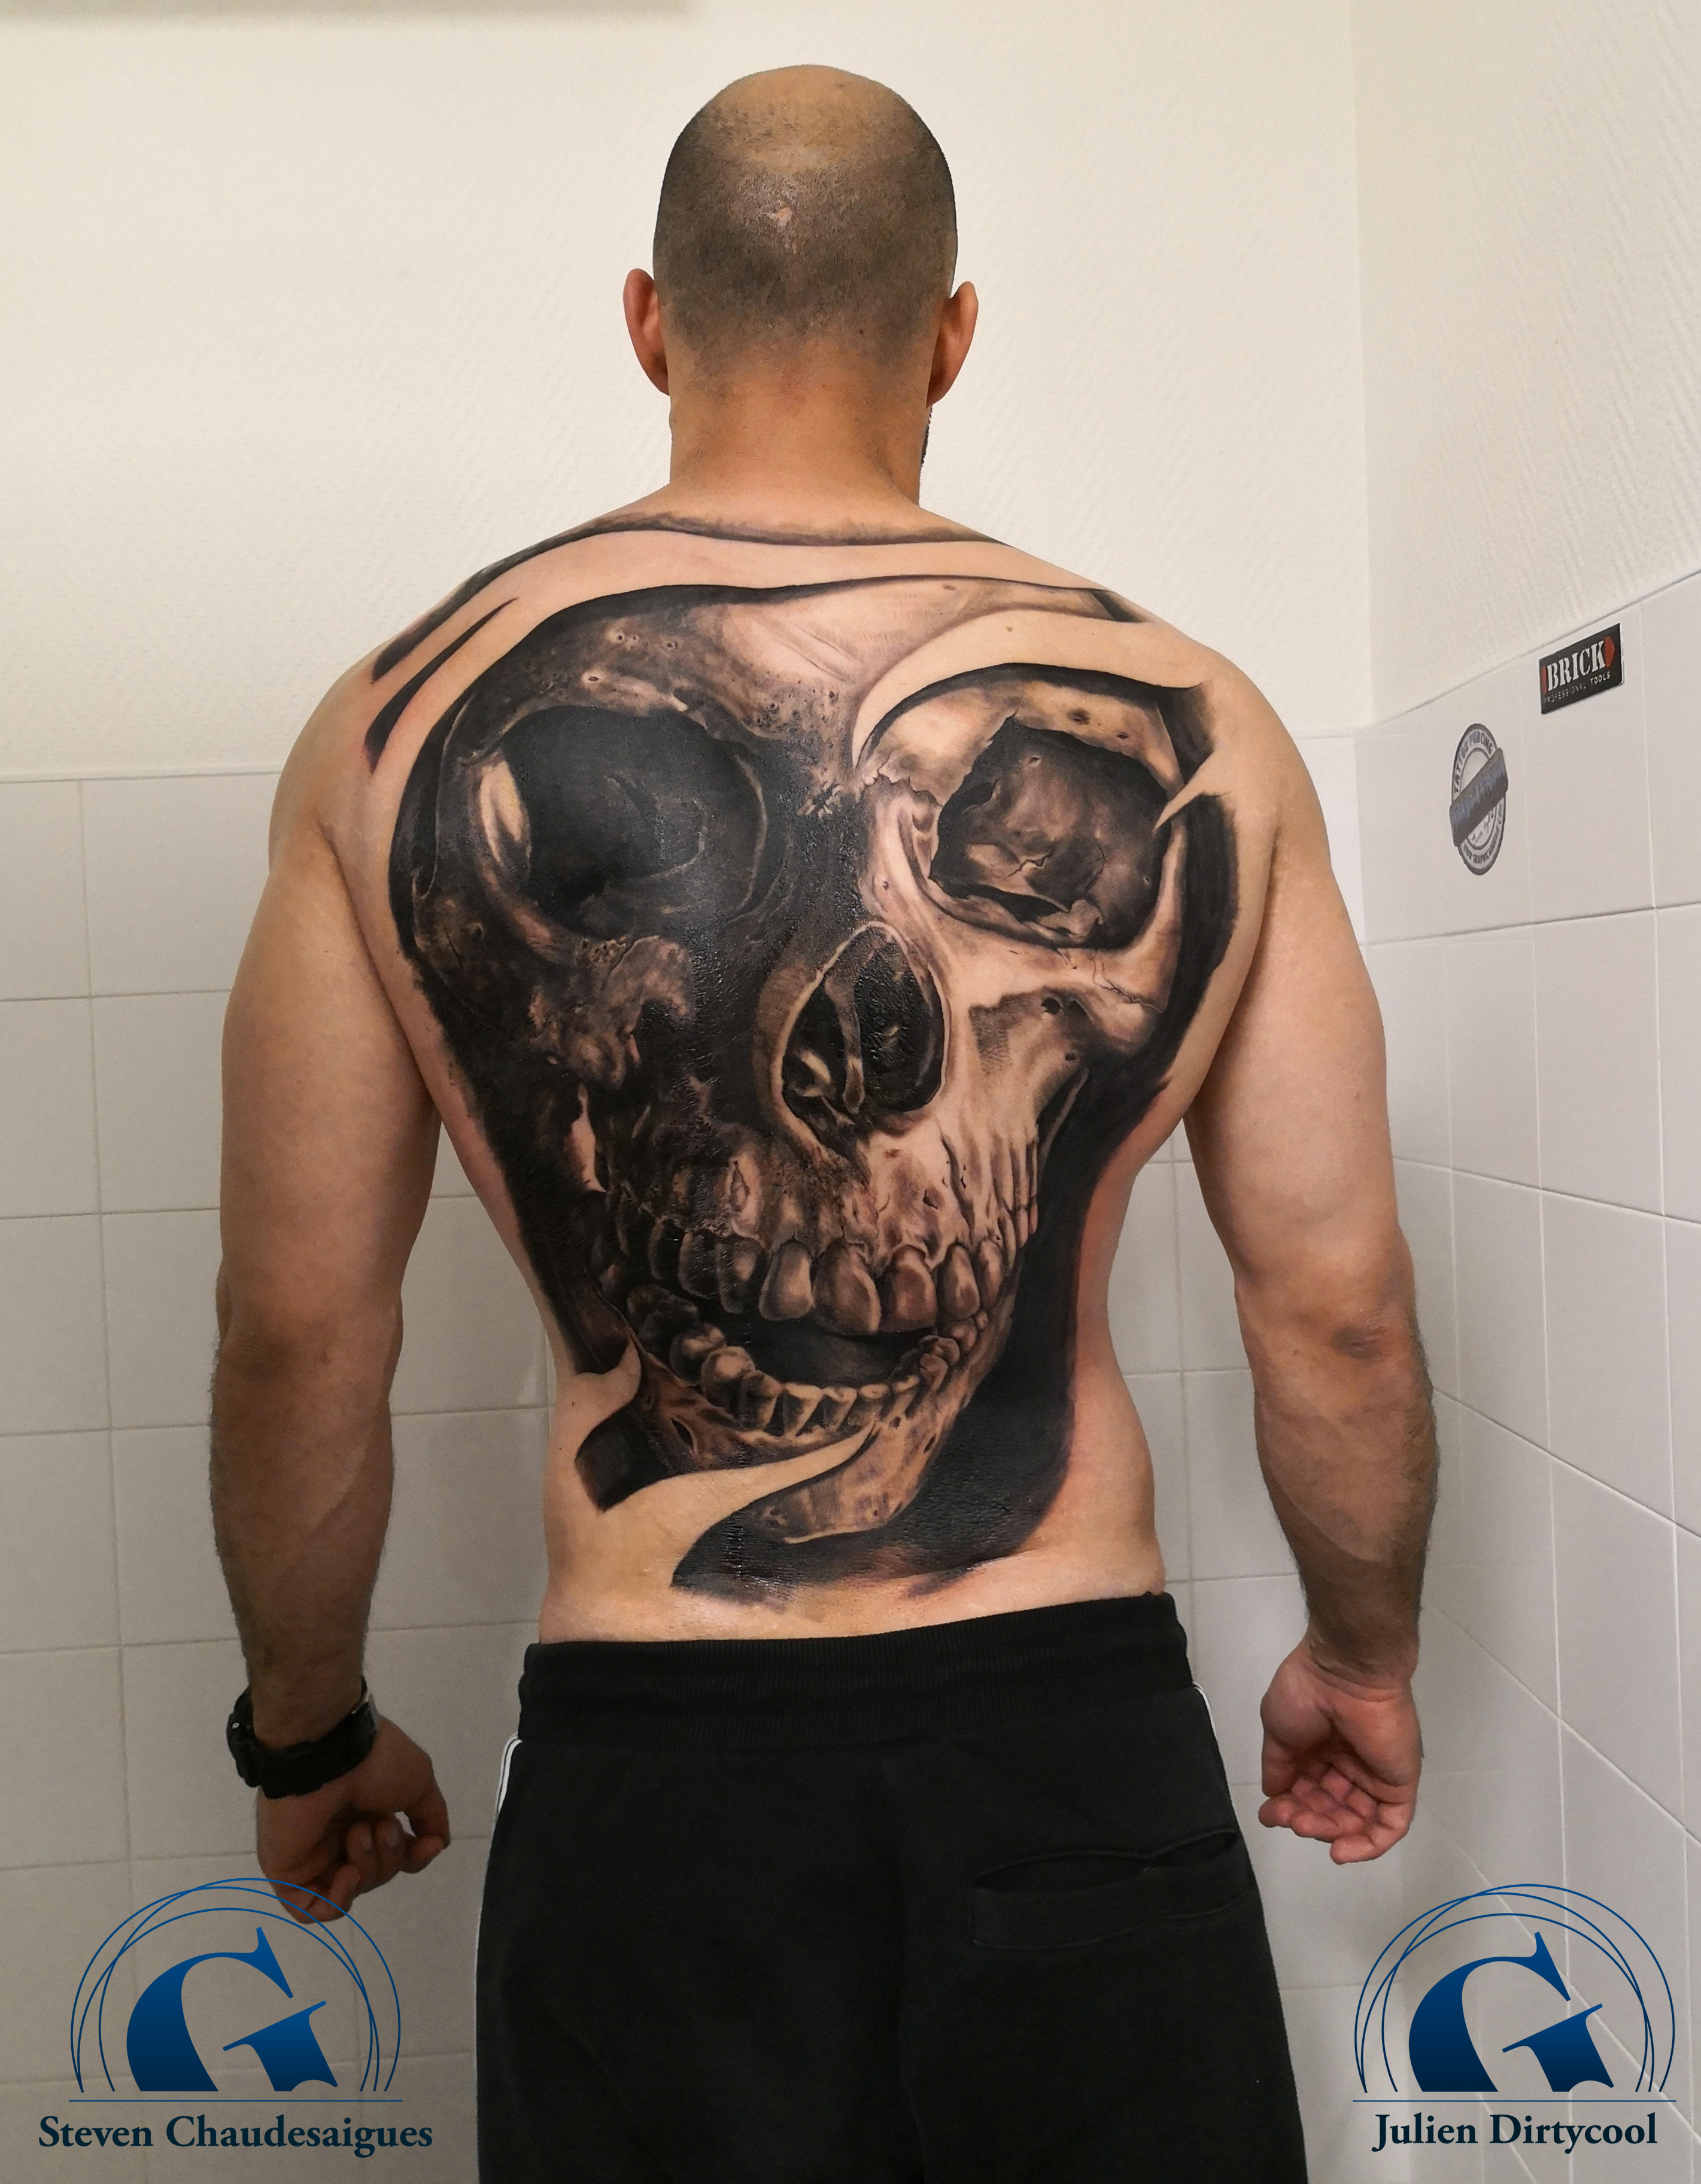 graphicaderme-avignon-vaucluse-doscimplet-stevenchaudesaigues-juliendirtycool-skull-crane-tattoo-tatouage.jpg